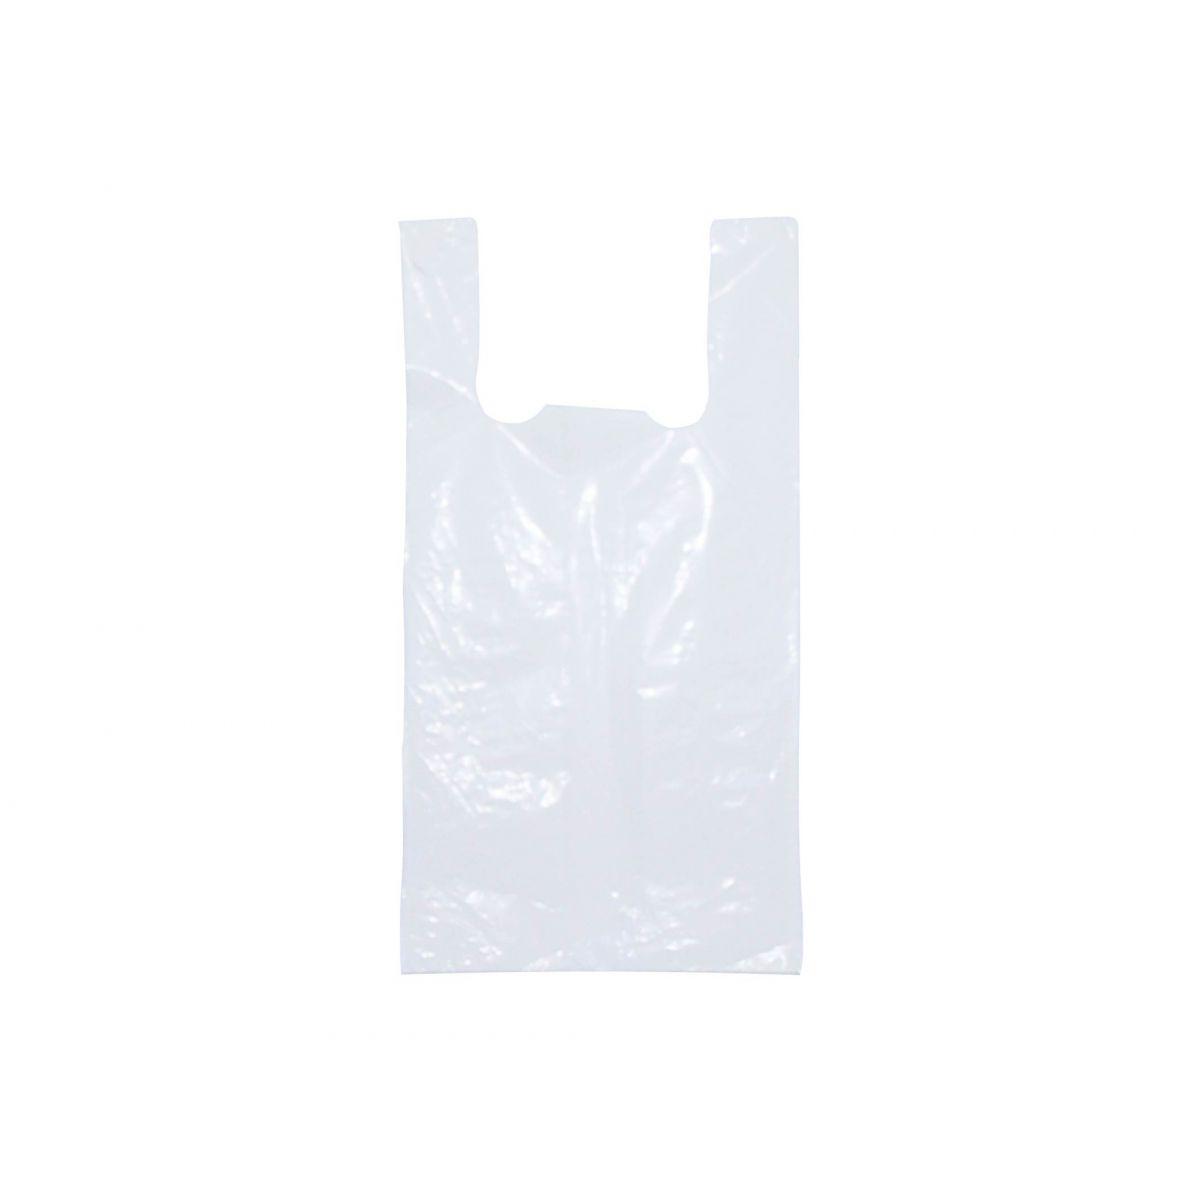 Sacola plástica Branca (espessura fina)- 40x50cm - Pacote 1000 unid